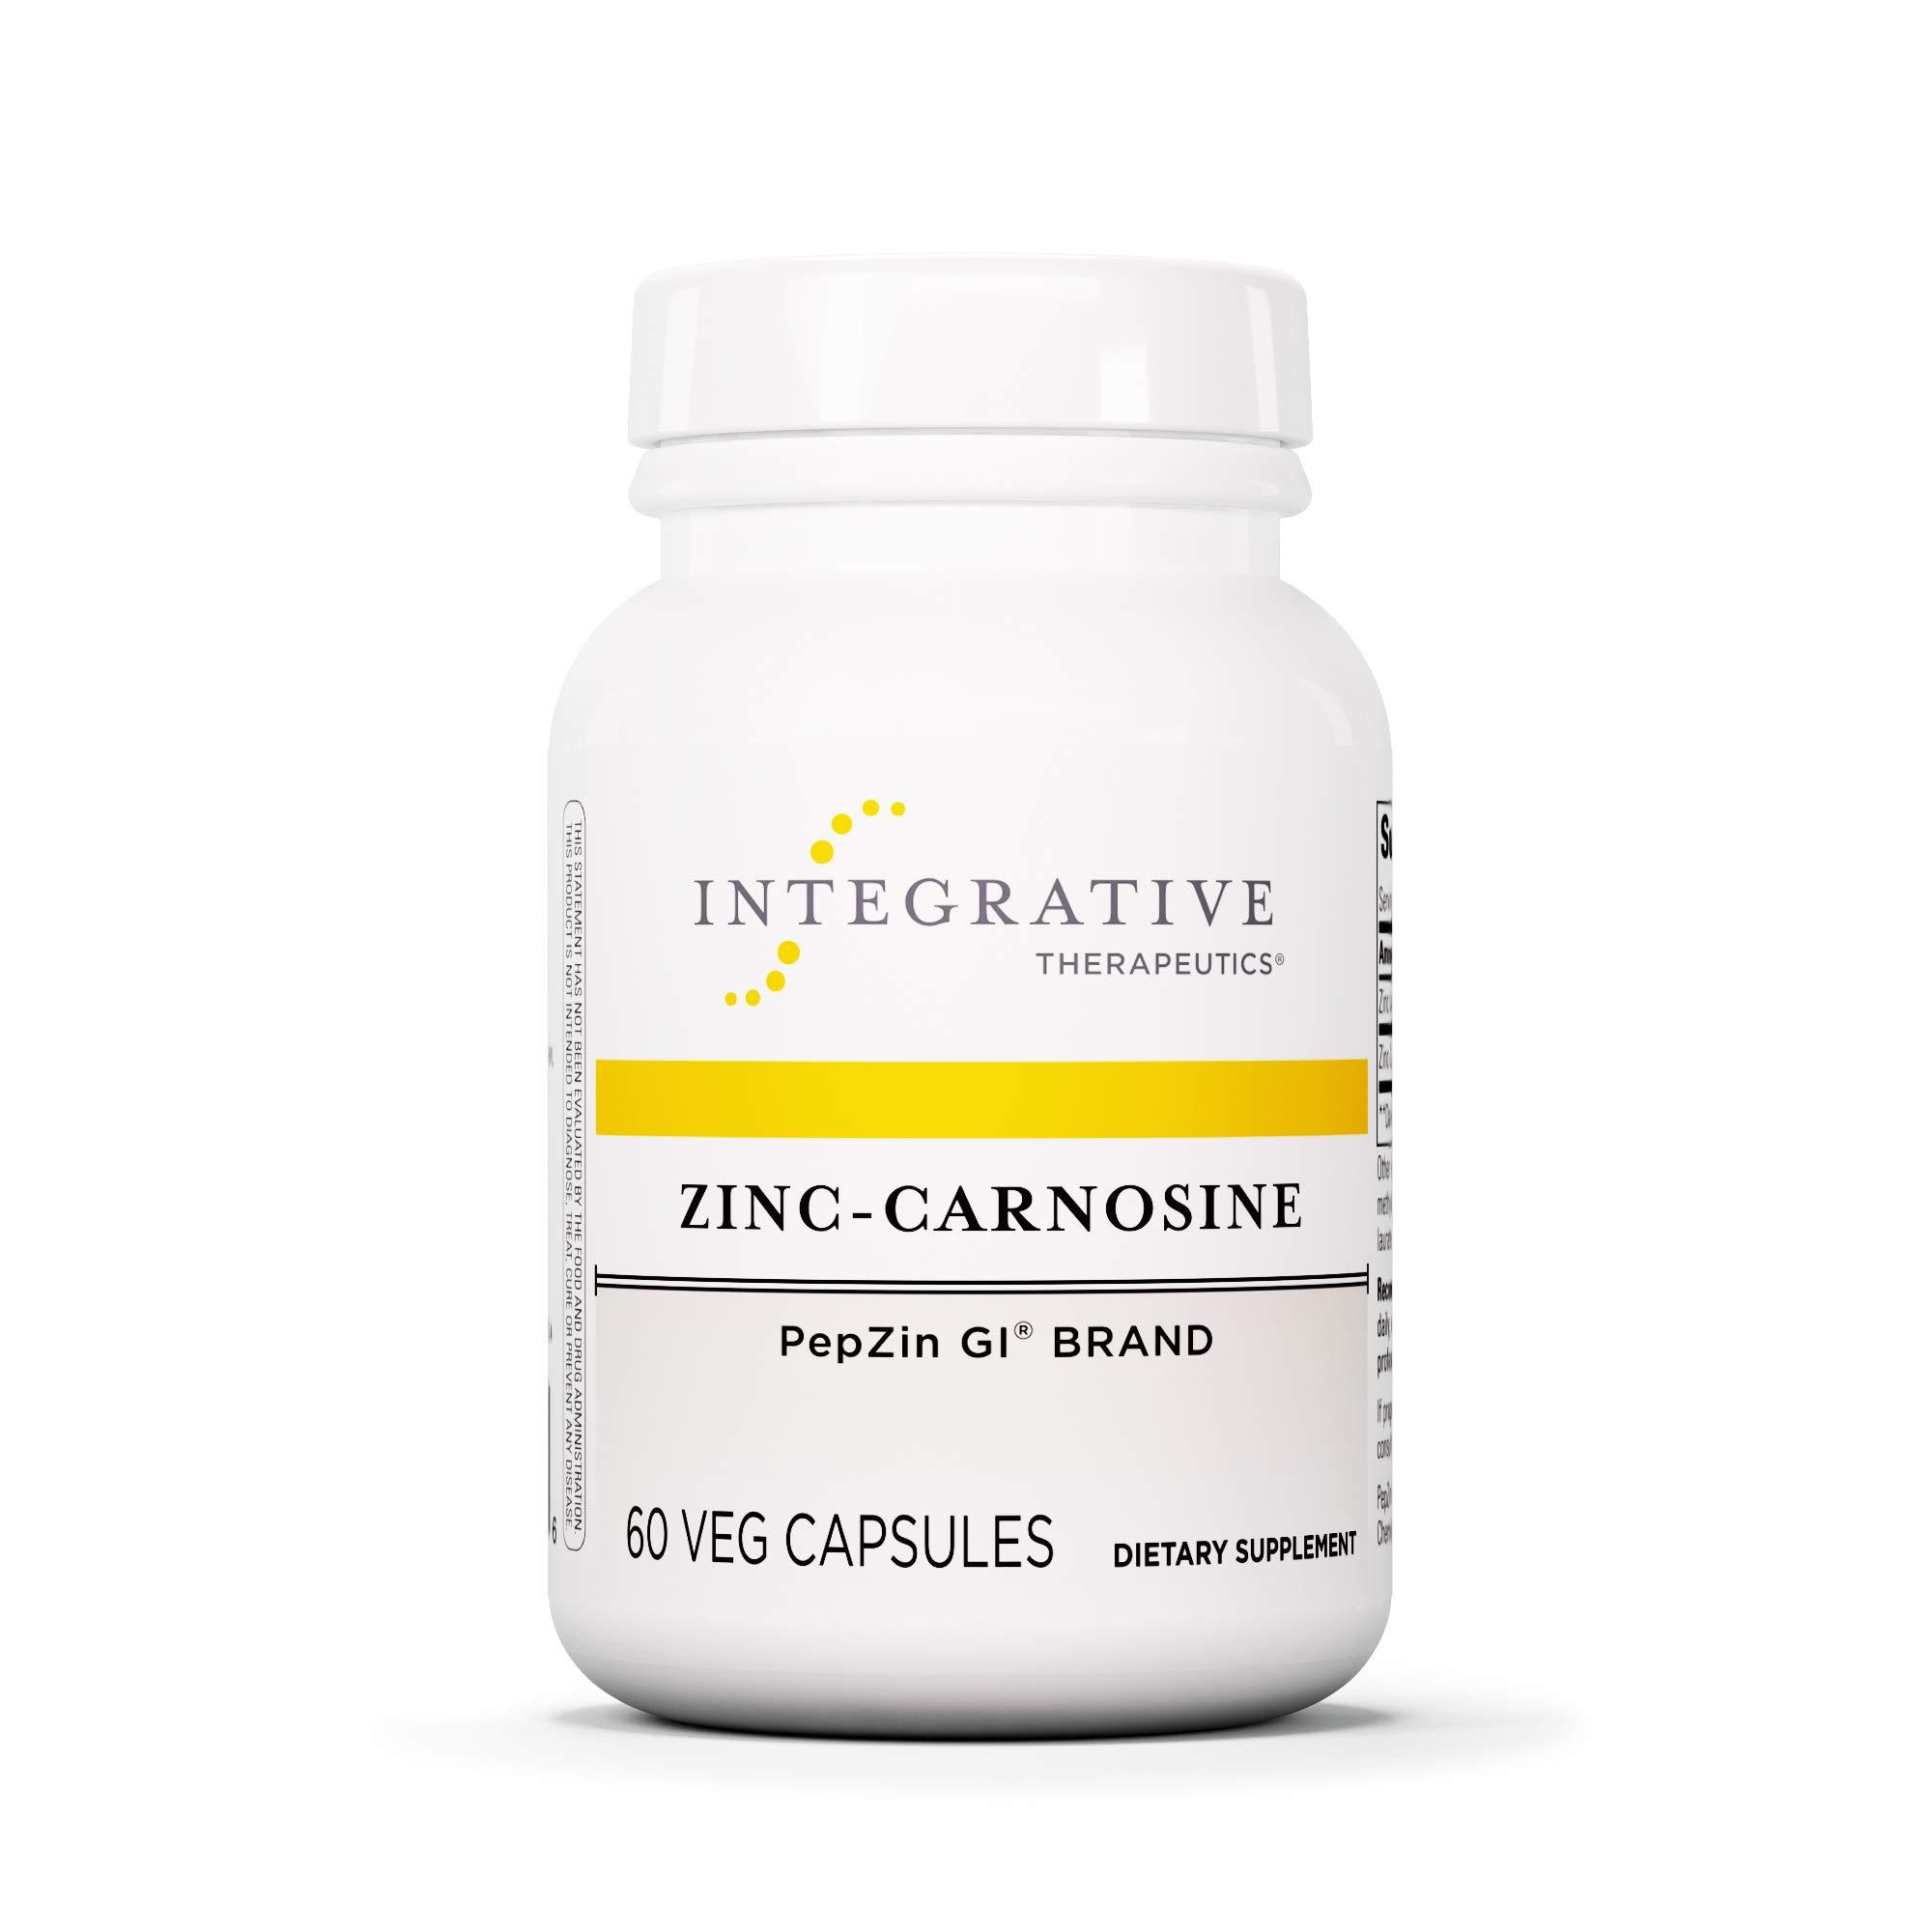 Integrative Therapeutics - Zinc-Carnosine - PepZin GI Brand - Supports Healthy Gastrointestinal Lining & Relieve Gastric Discomfort - 60 Capsules